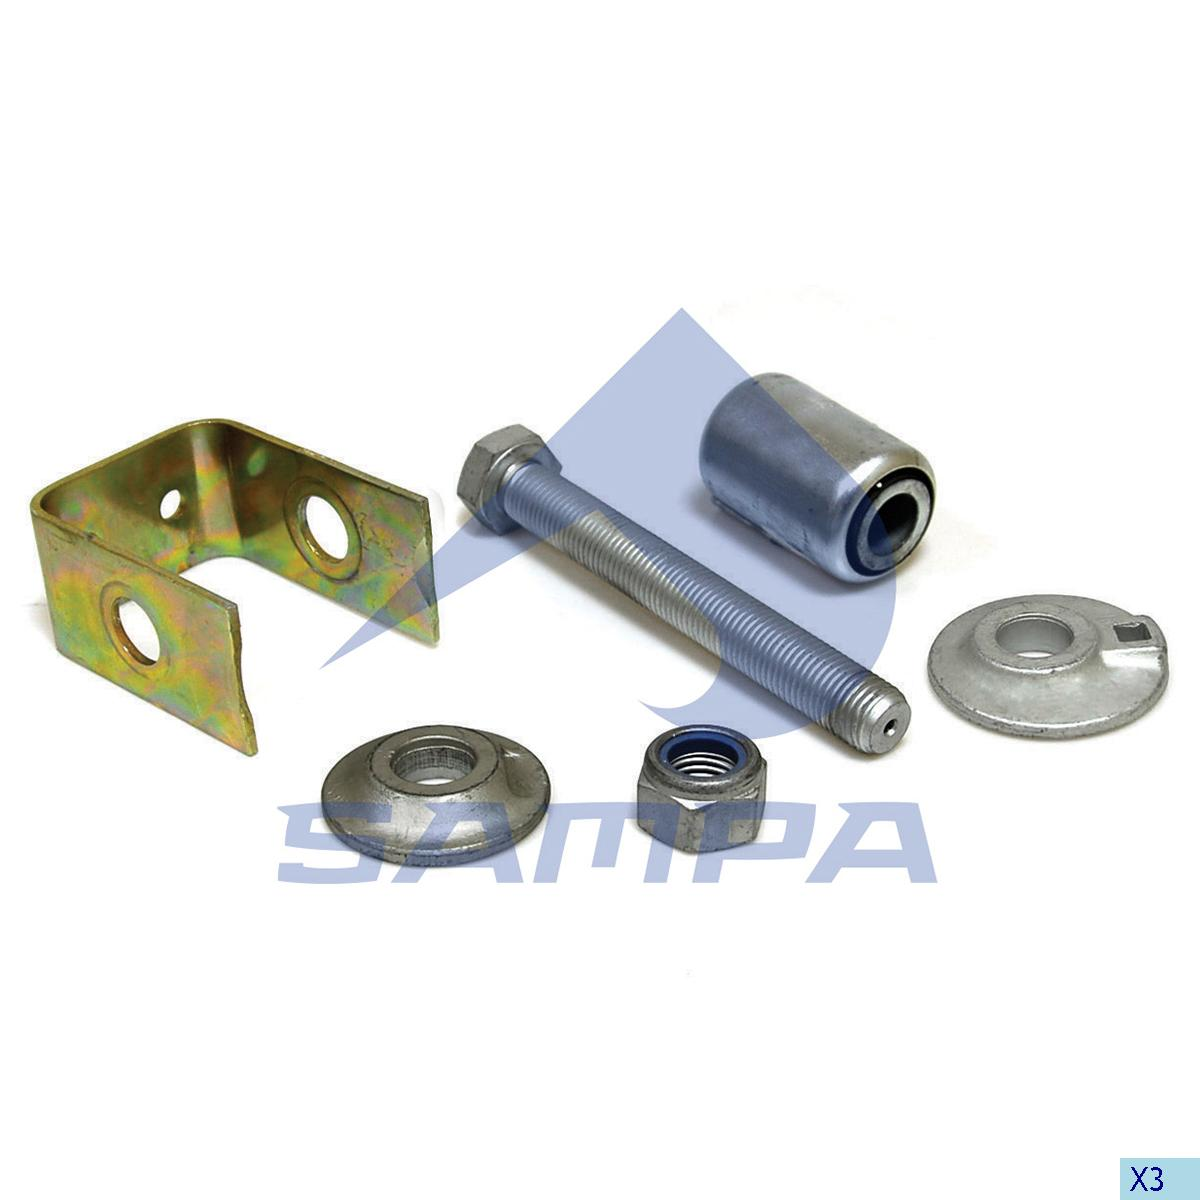 Repair Kit, Spring, Sauer Achsen, Suspension